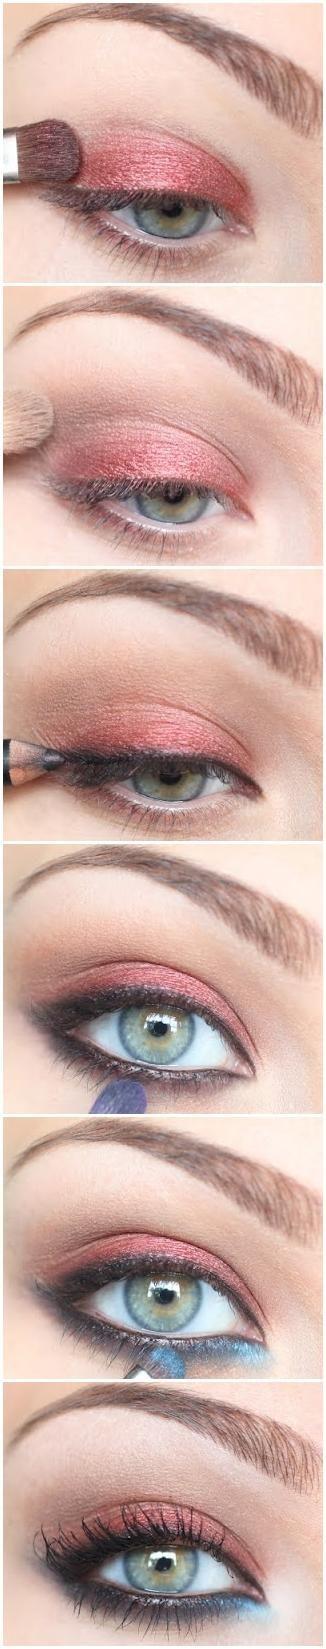 eyeshadow: coral shadow on top, light blue in the lower inner corner